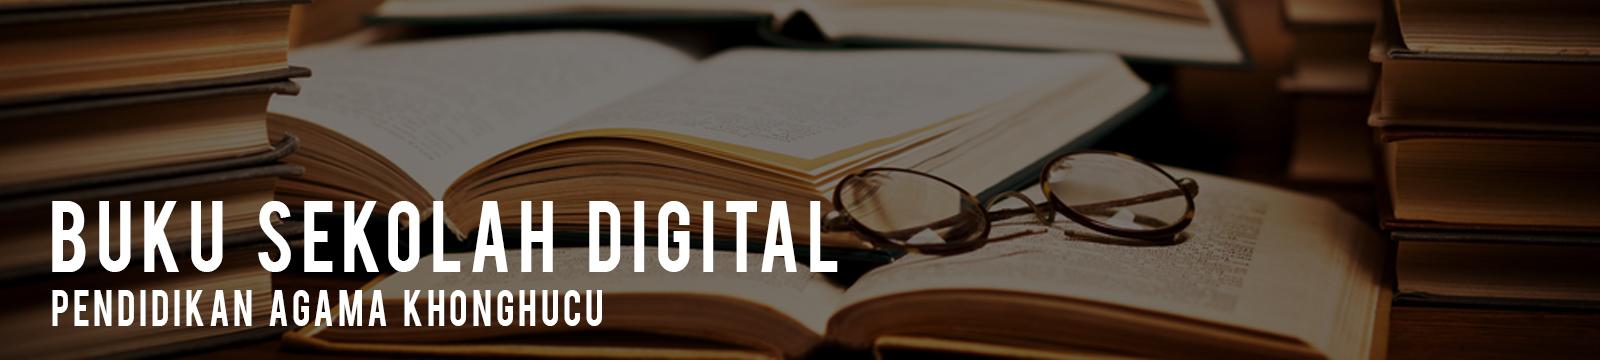 Buku Sekolah Digital Genta Rohani